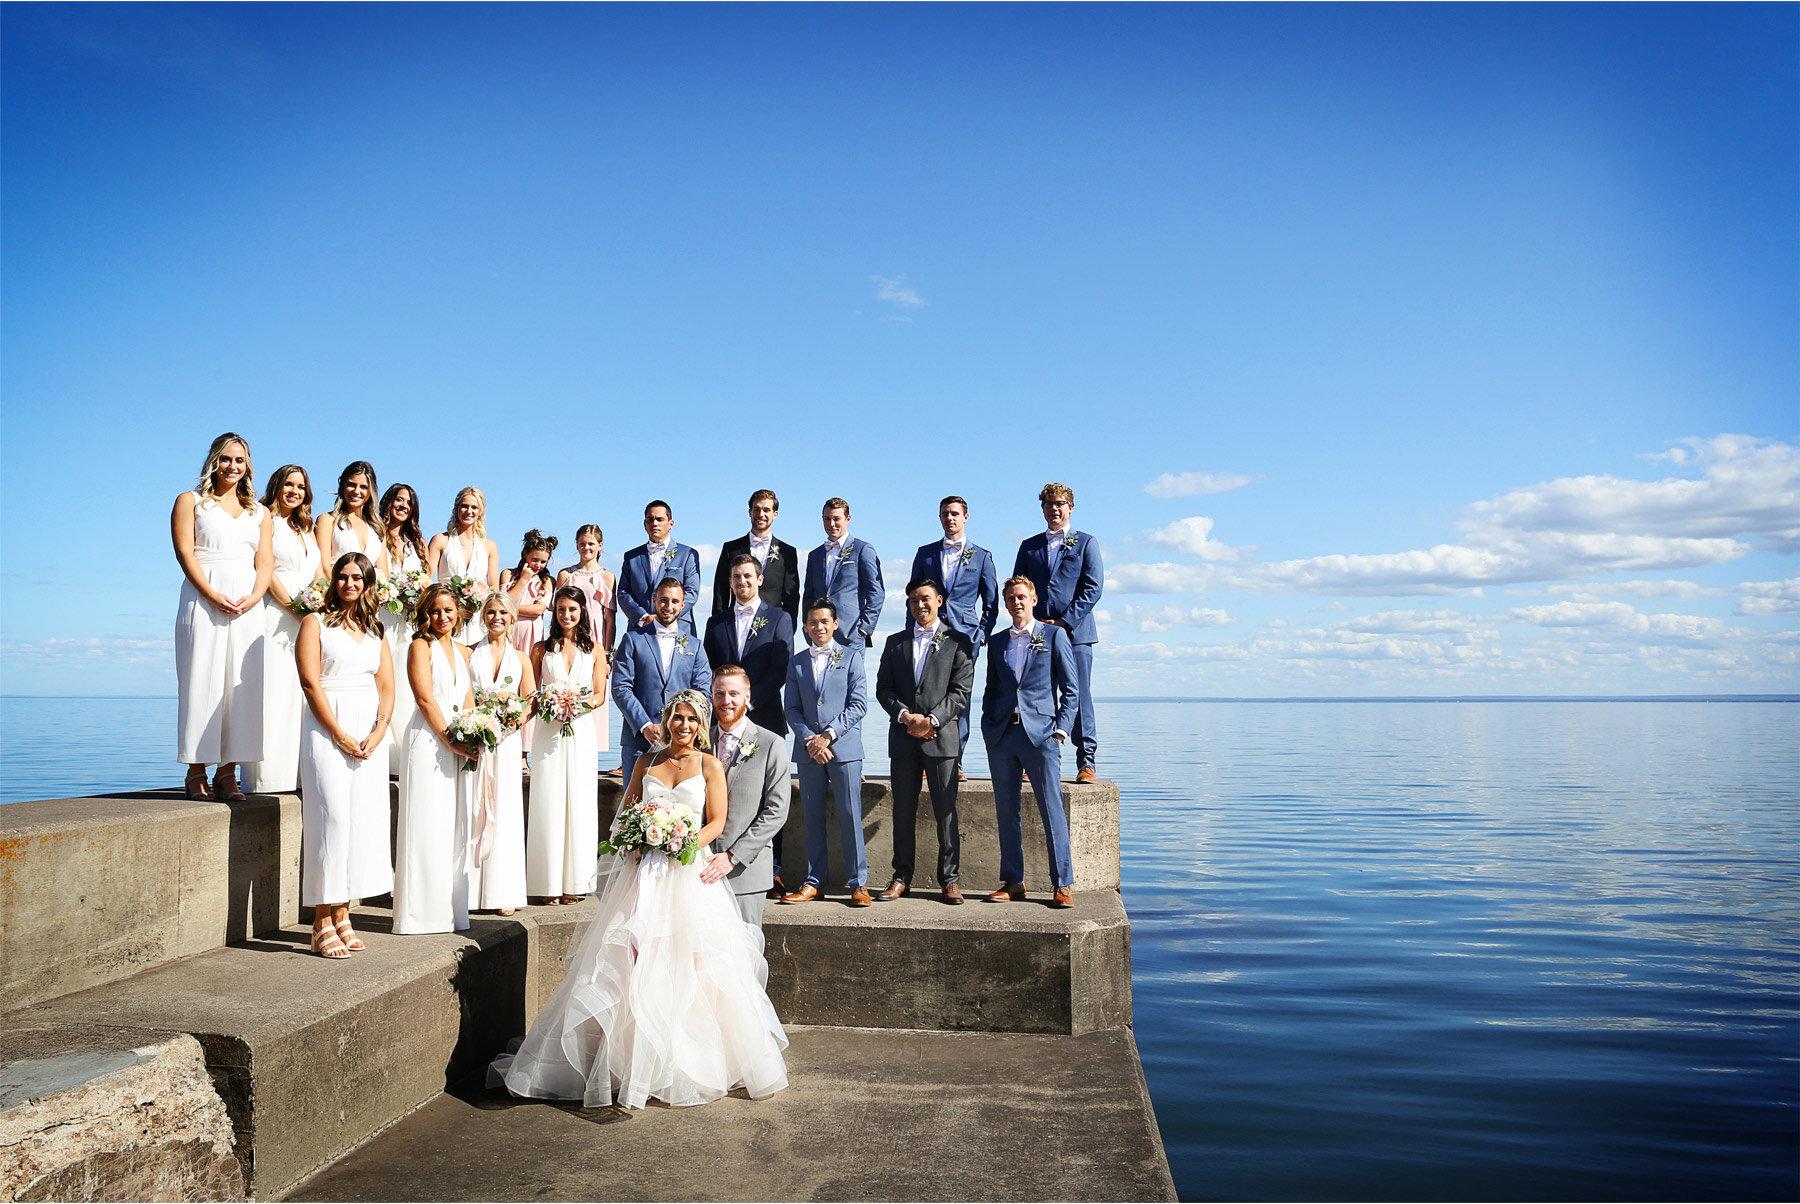 10-Vick-Photography-Wedding-Duluth-Minnesota-Glensheen-Mansion-Groom-Bride-Bridesmaids-Groomsmen-Lake-Superior-Catherine-and-John.jpg